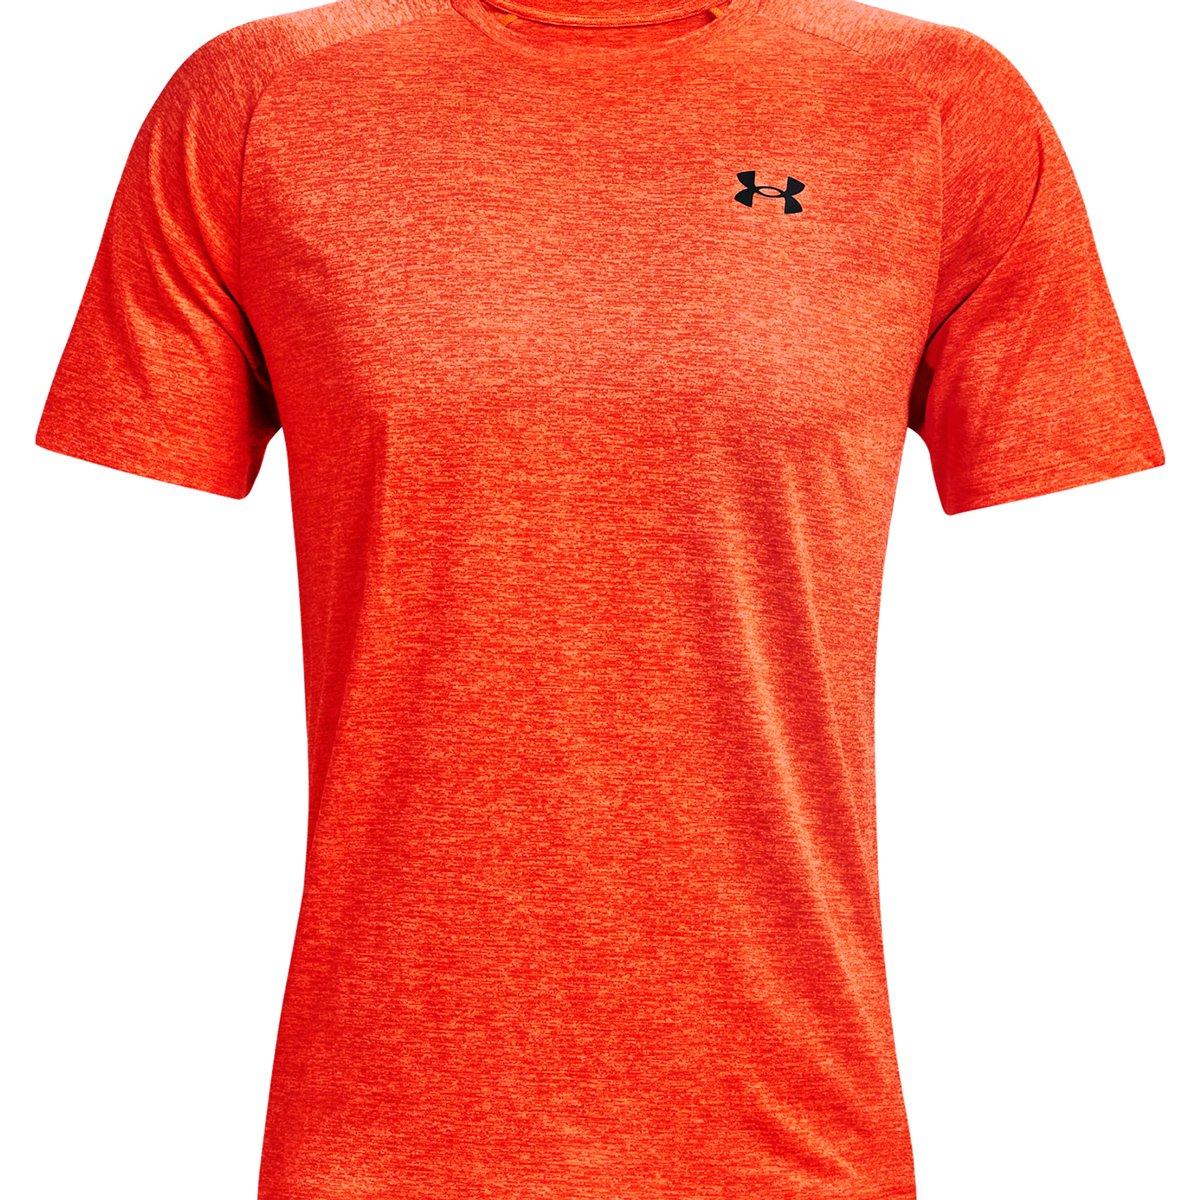 Køb Under Armour Tech 2.0 T-shirt Herre, orange